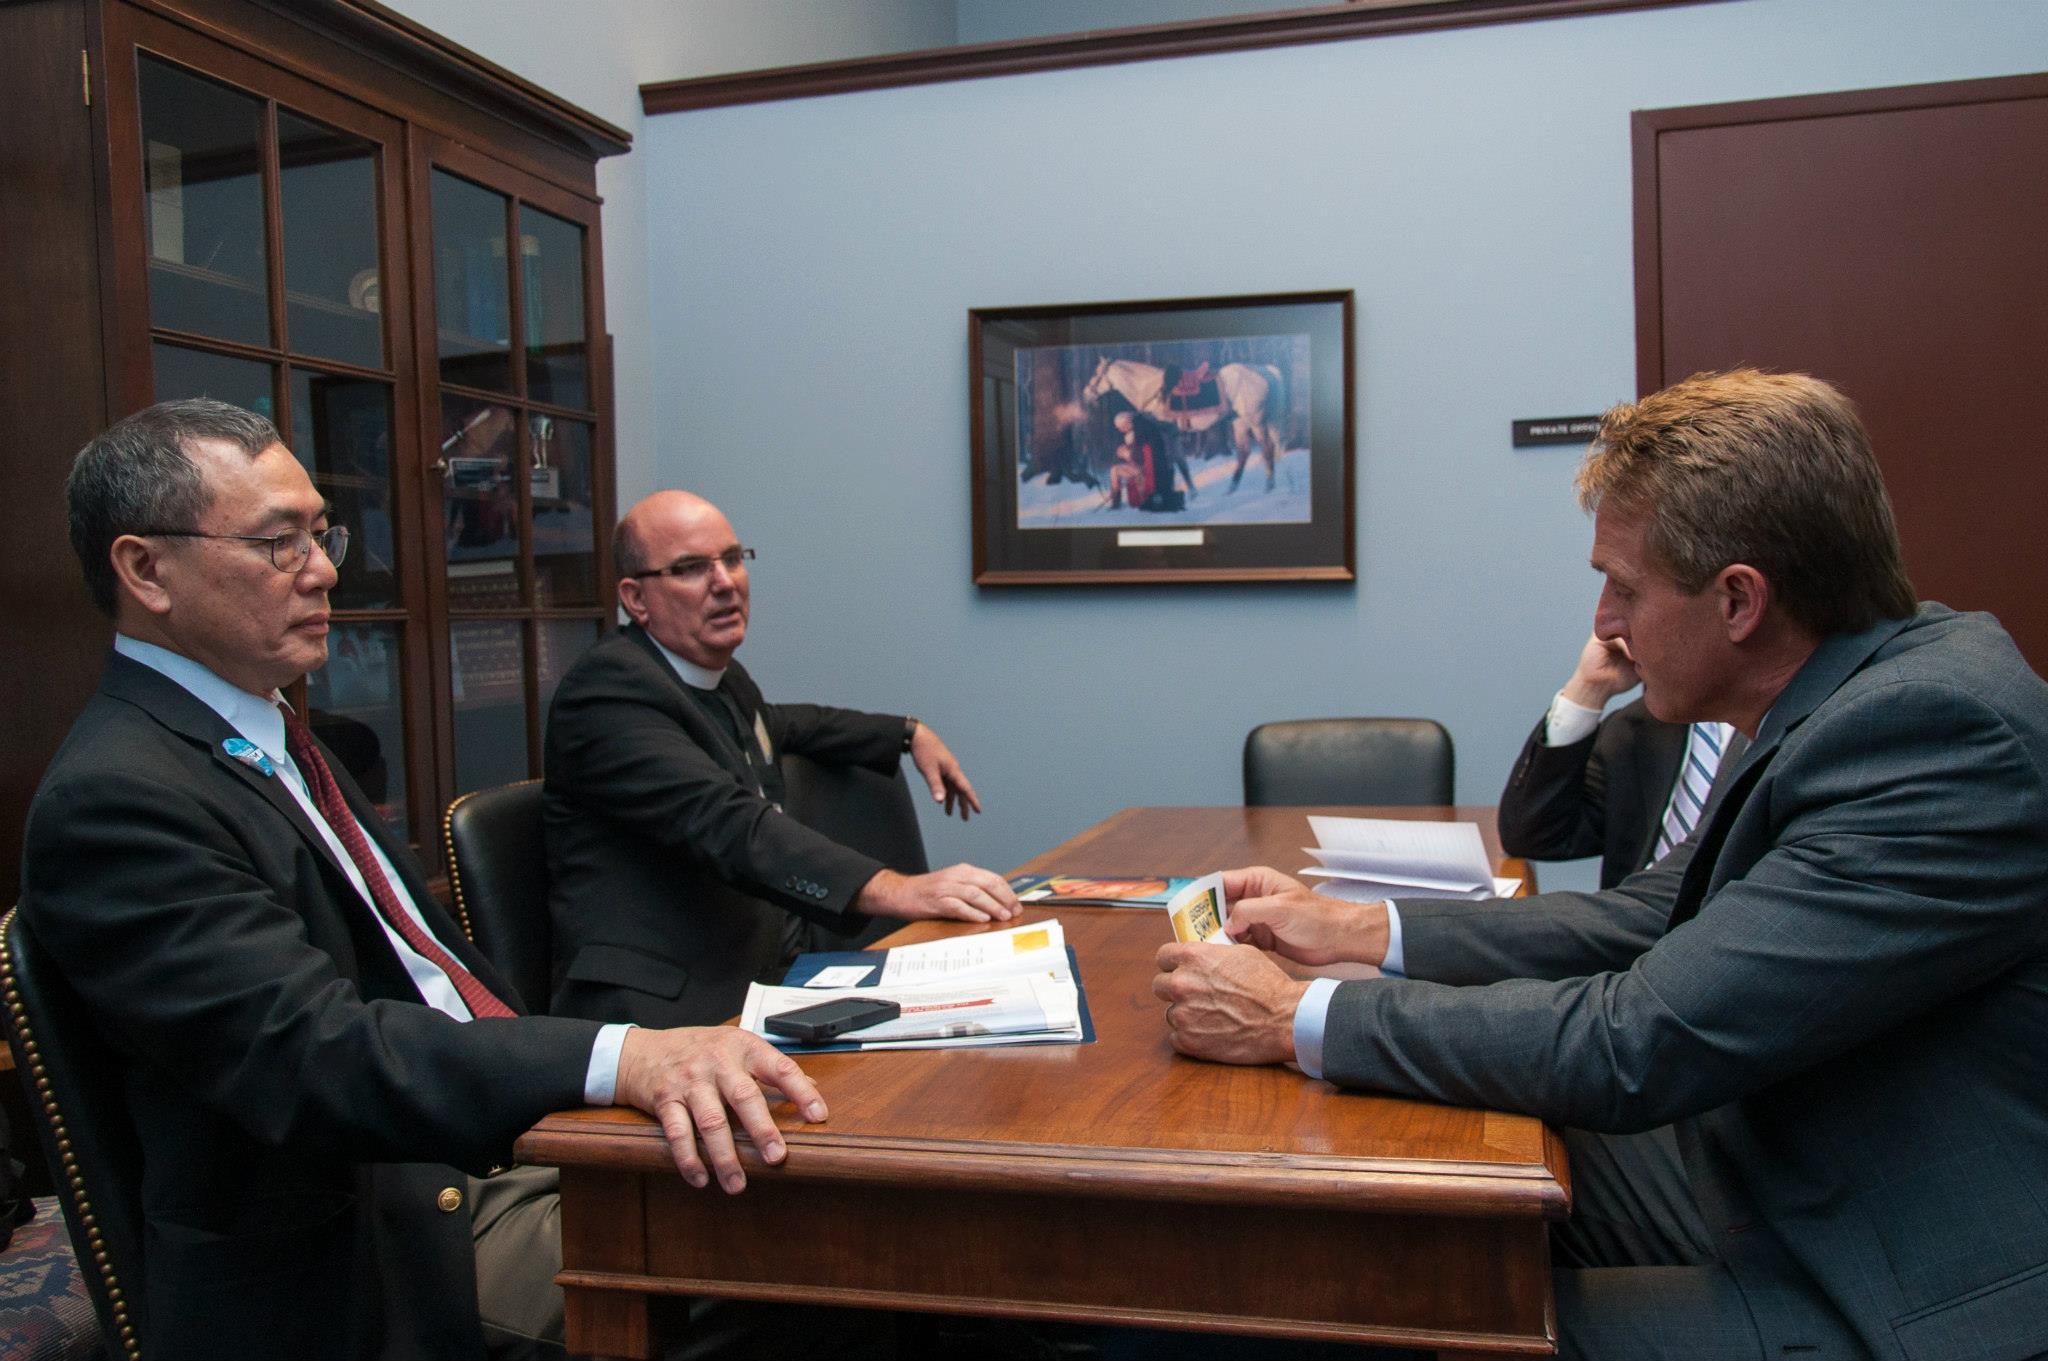 Lutheran leaders meet with Senator Flake. L-R: Chak Ng, Bishop Steve Talmage, Senator Jeff Flake